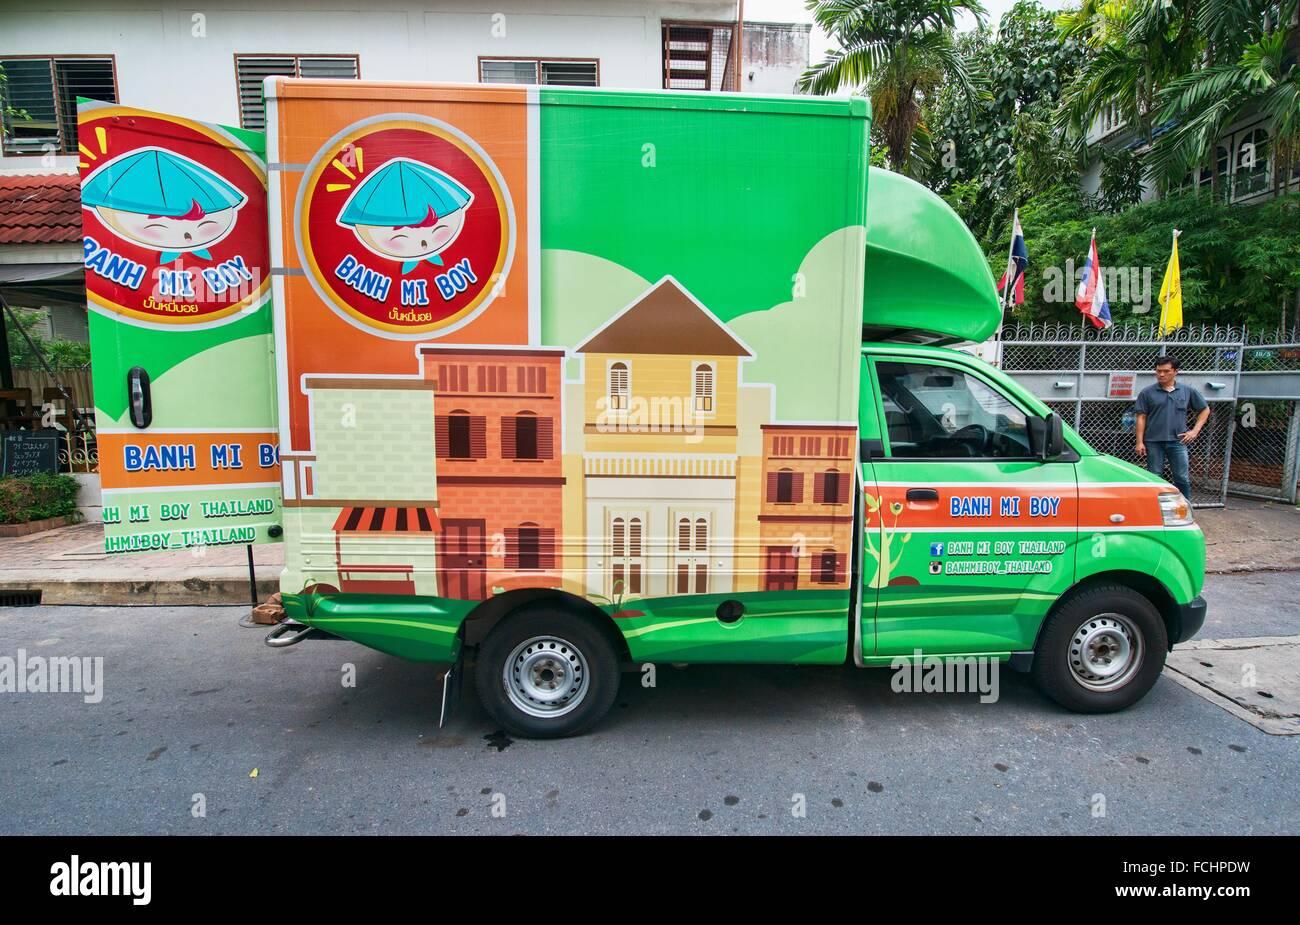 food truck and outdoor dining, Bangkok, Thailand. - Stock Image